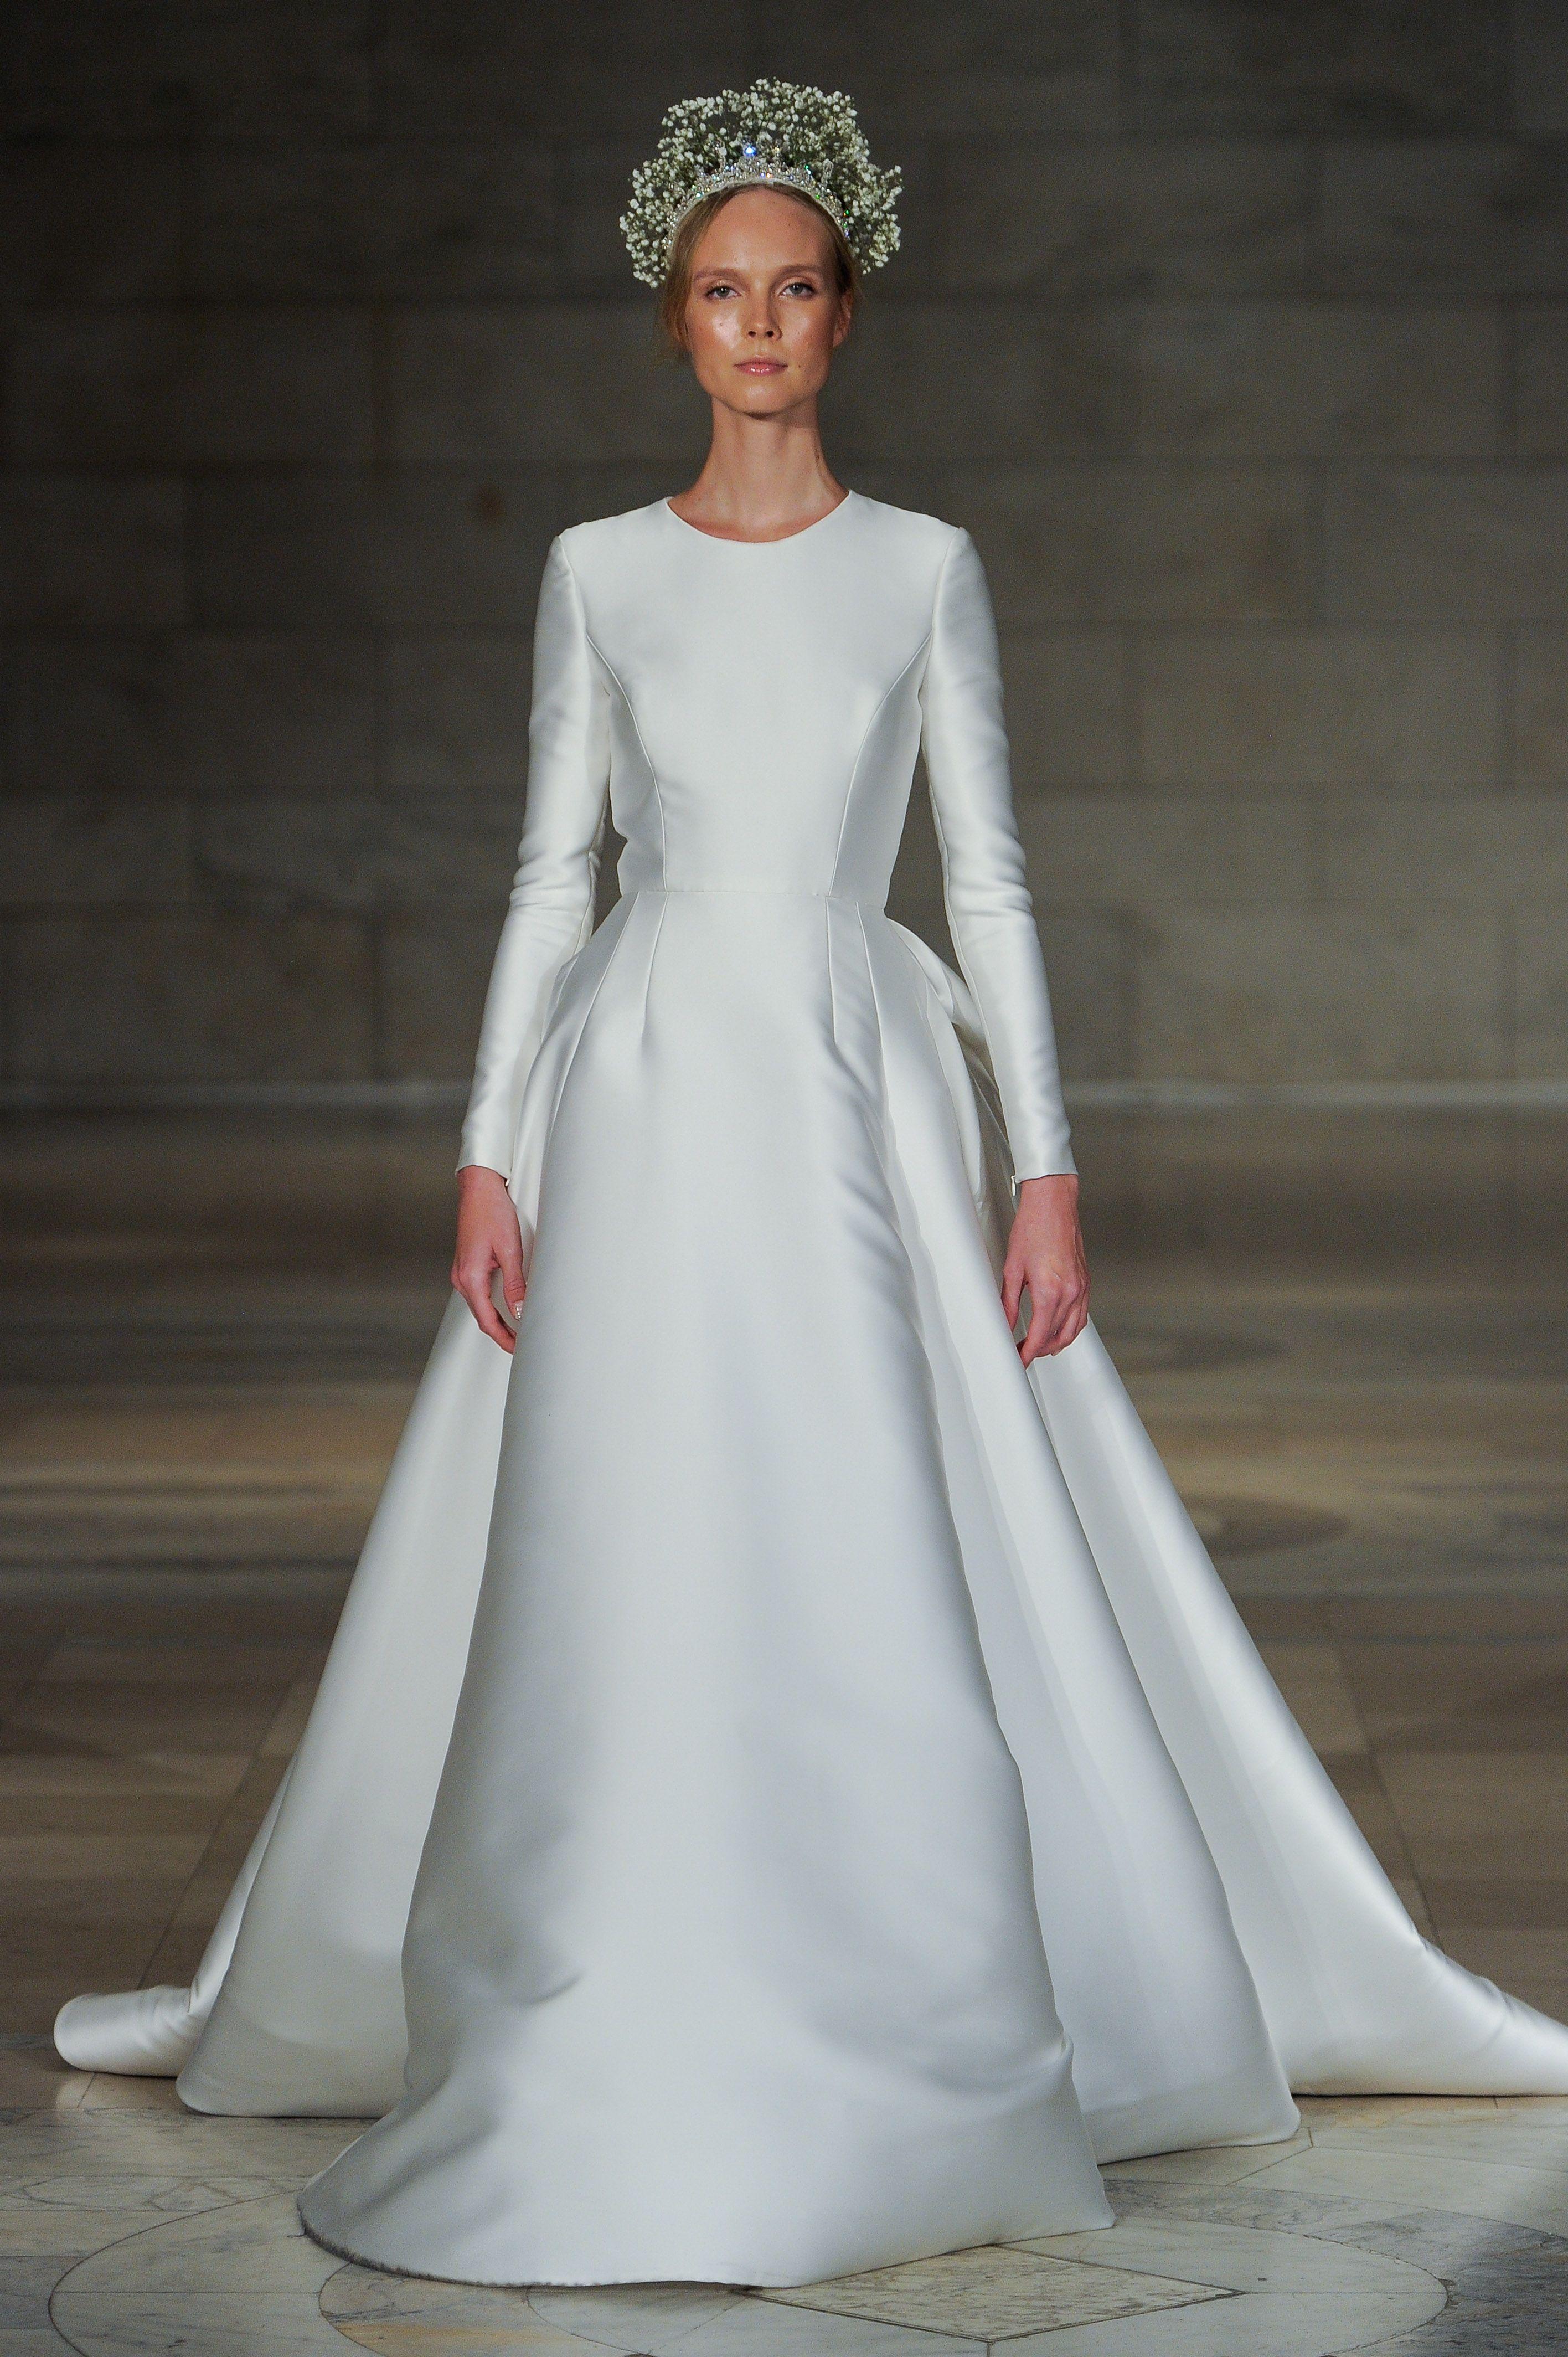 25 Simple Wedding Dresses From Fall 2018 Bridal Week